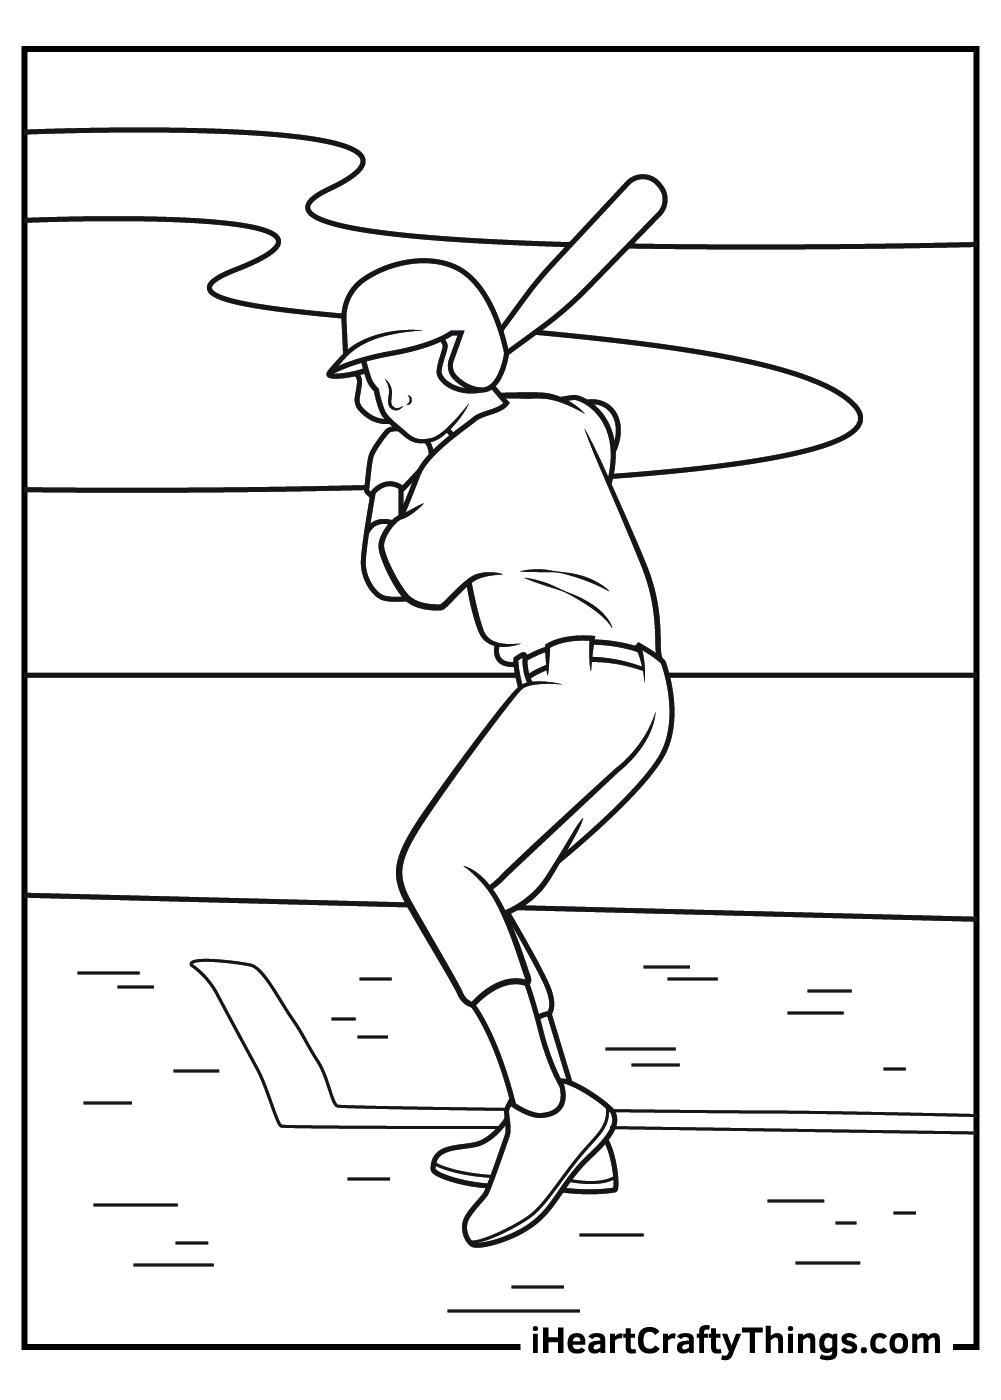 printable baseball player coloring pages